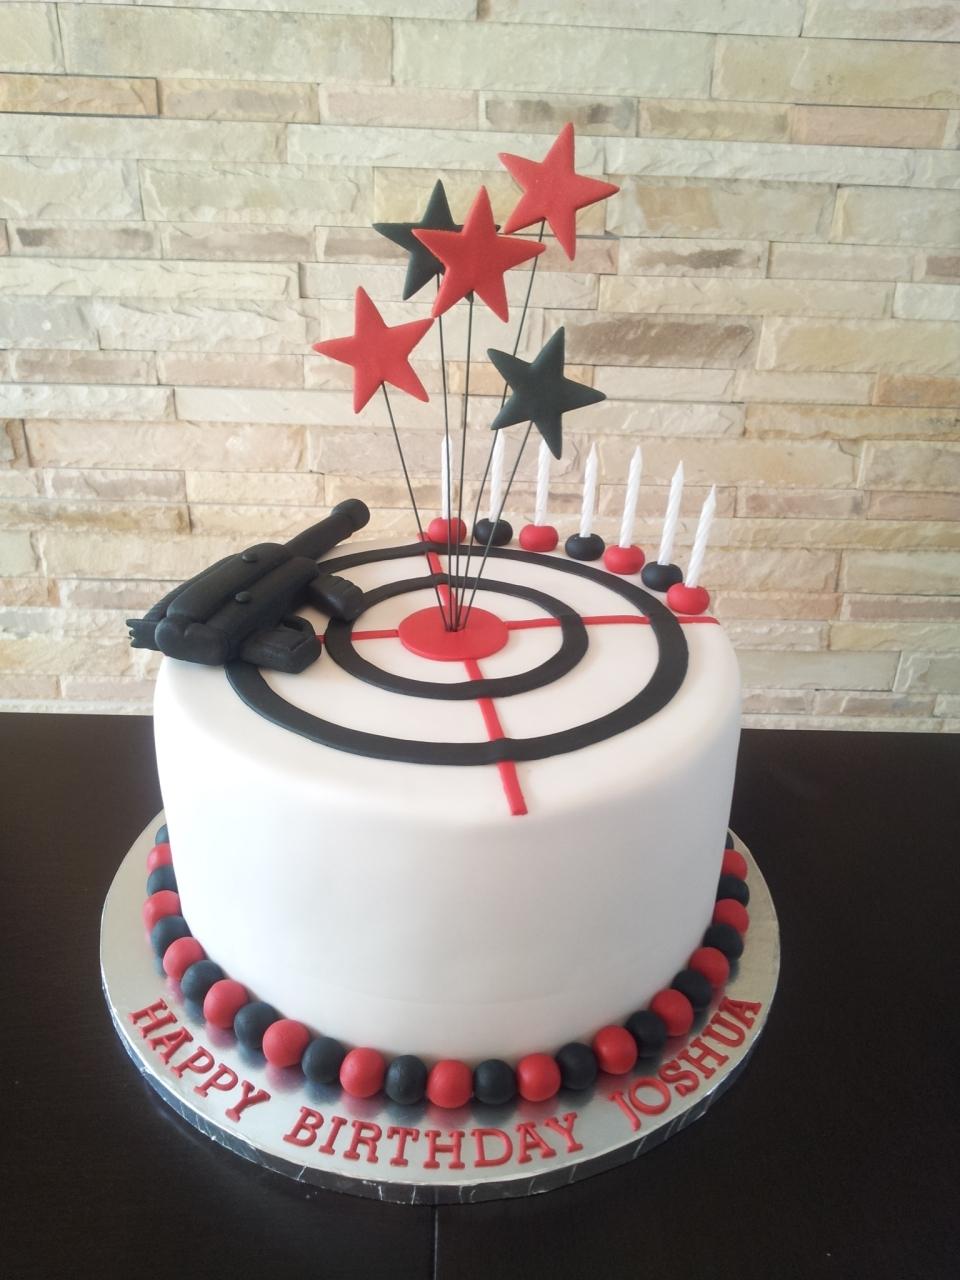 Laser Tag Themed Birthday Cake